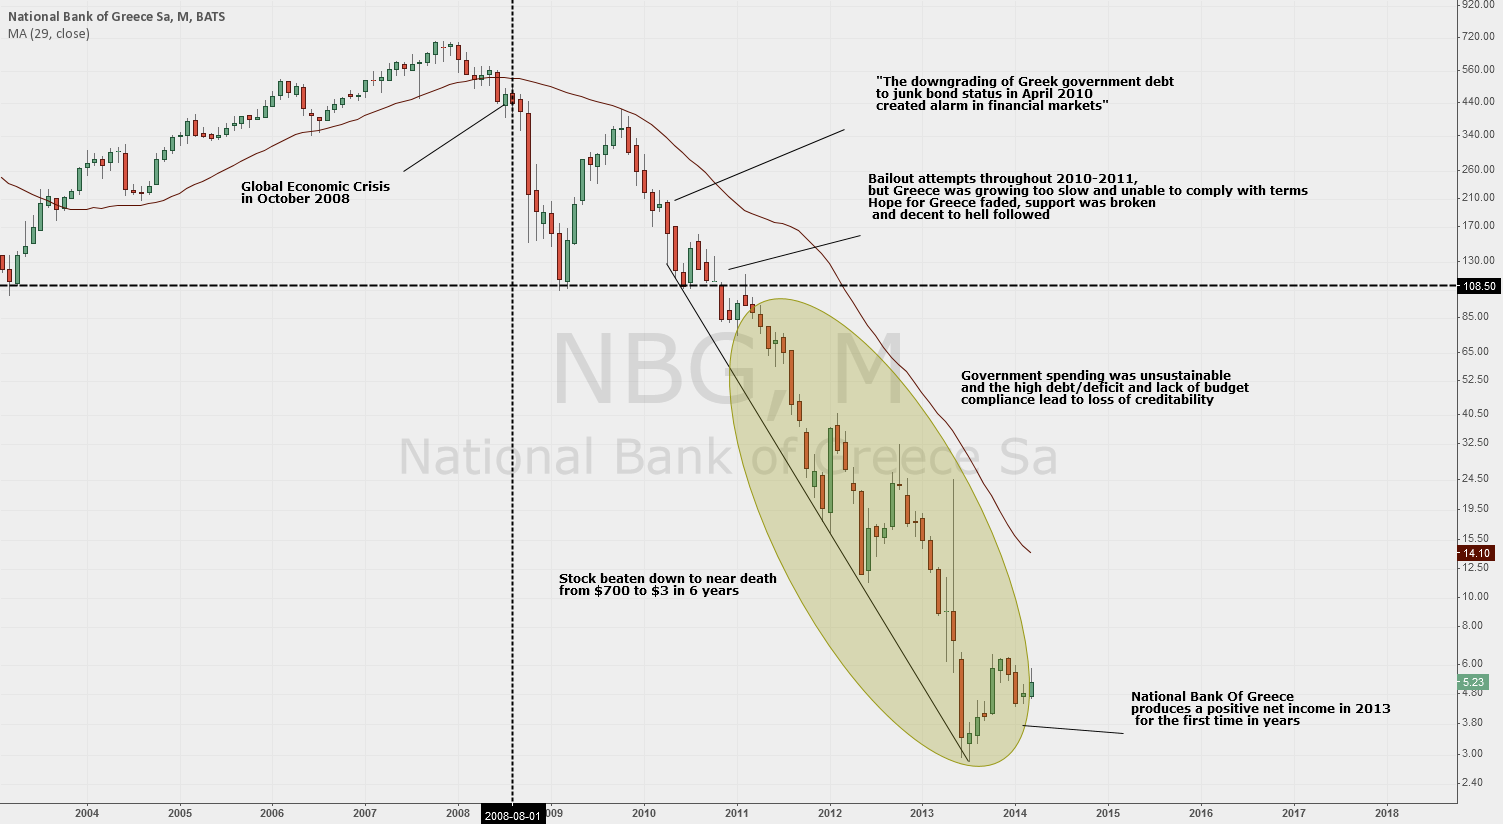 NBG breakdown